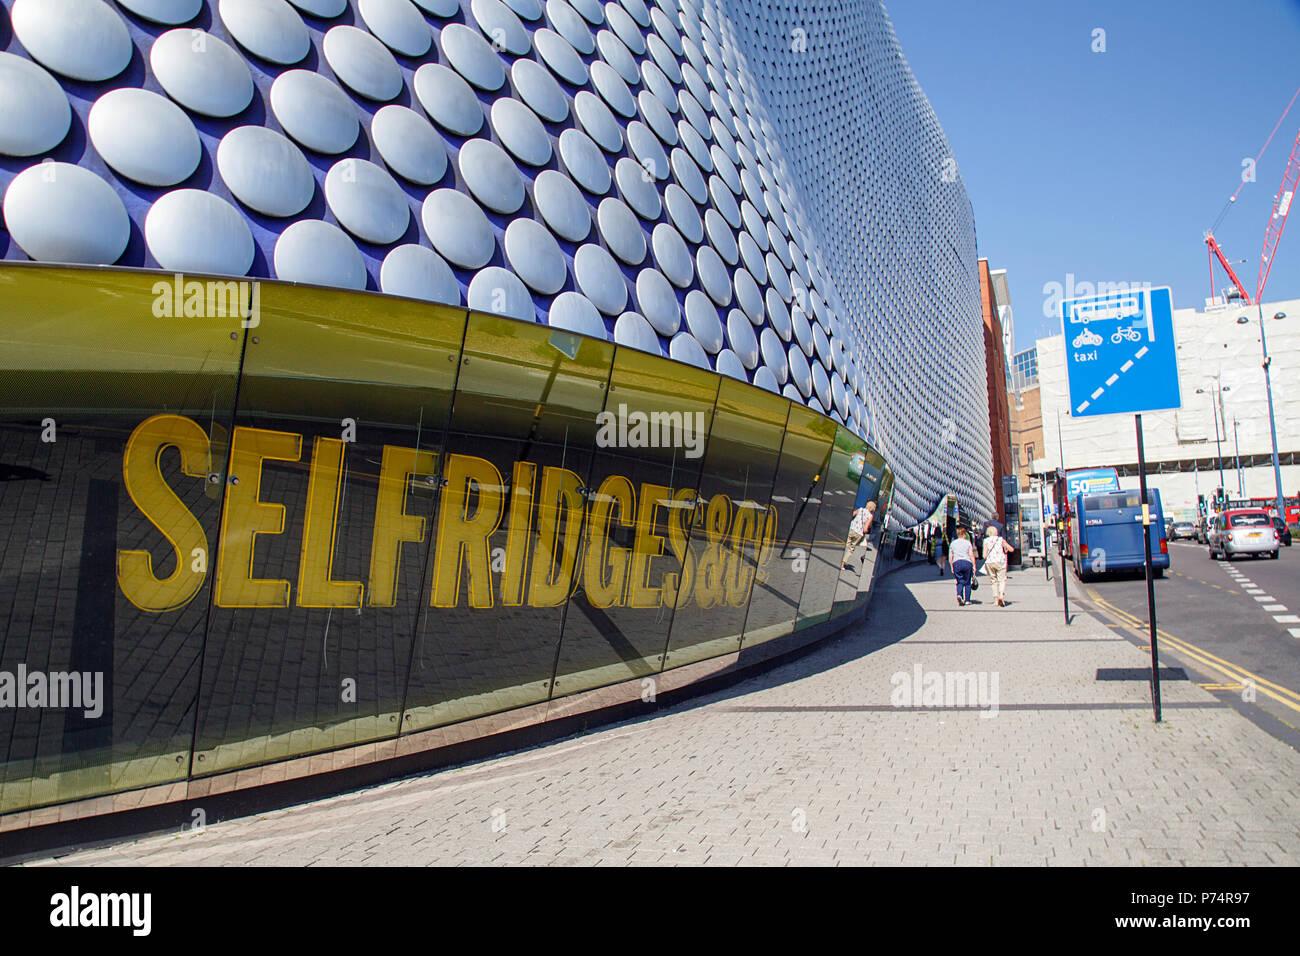 Birmingham, UK: June 29, 2018: Selfridges Department Store in Park Street - part of the Bullring Shopping Centre. Pedestrians walk toward the bus stop - Stock Image